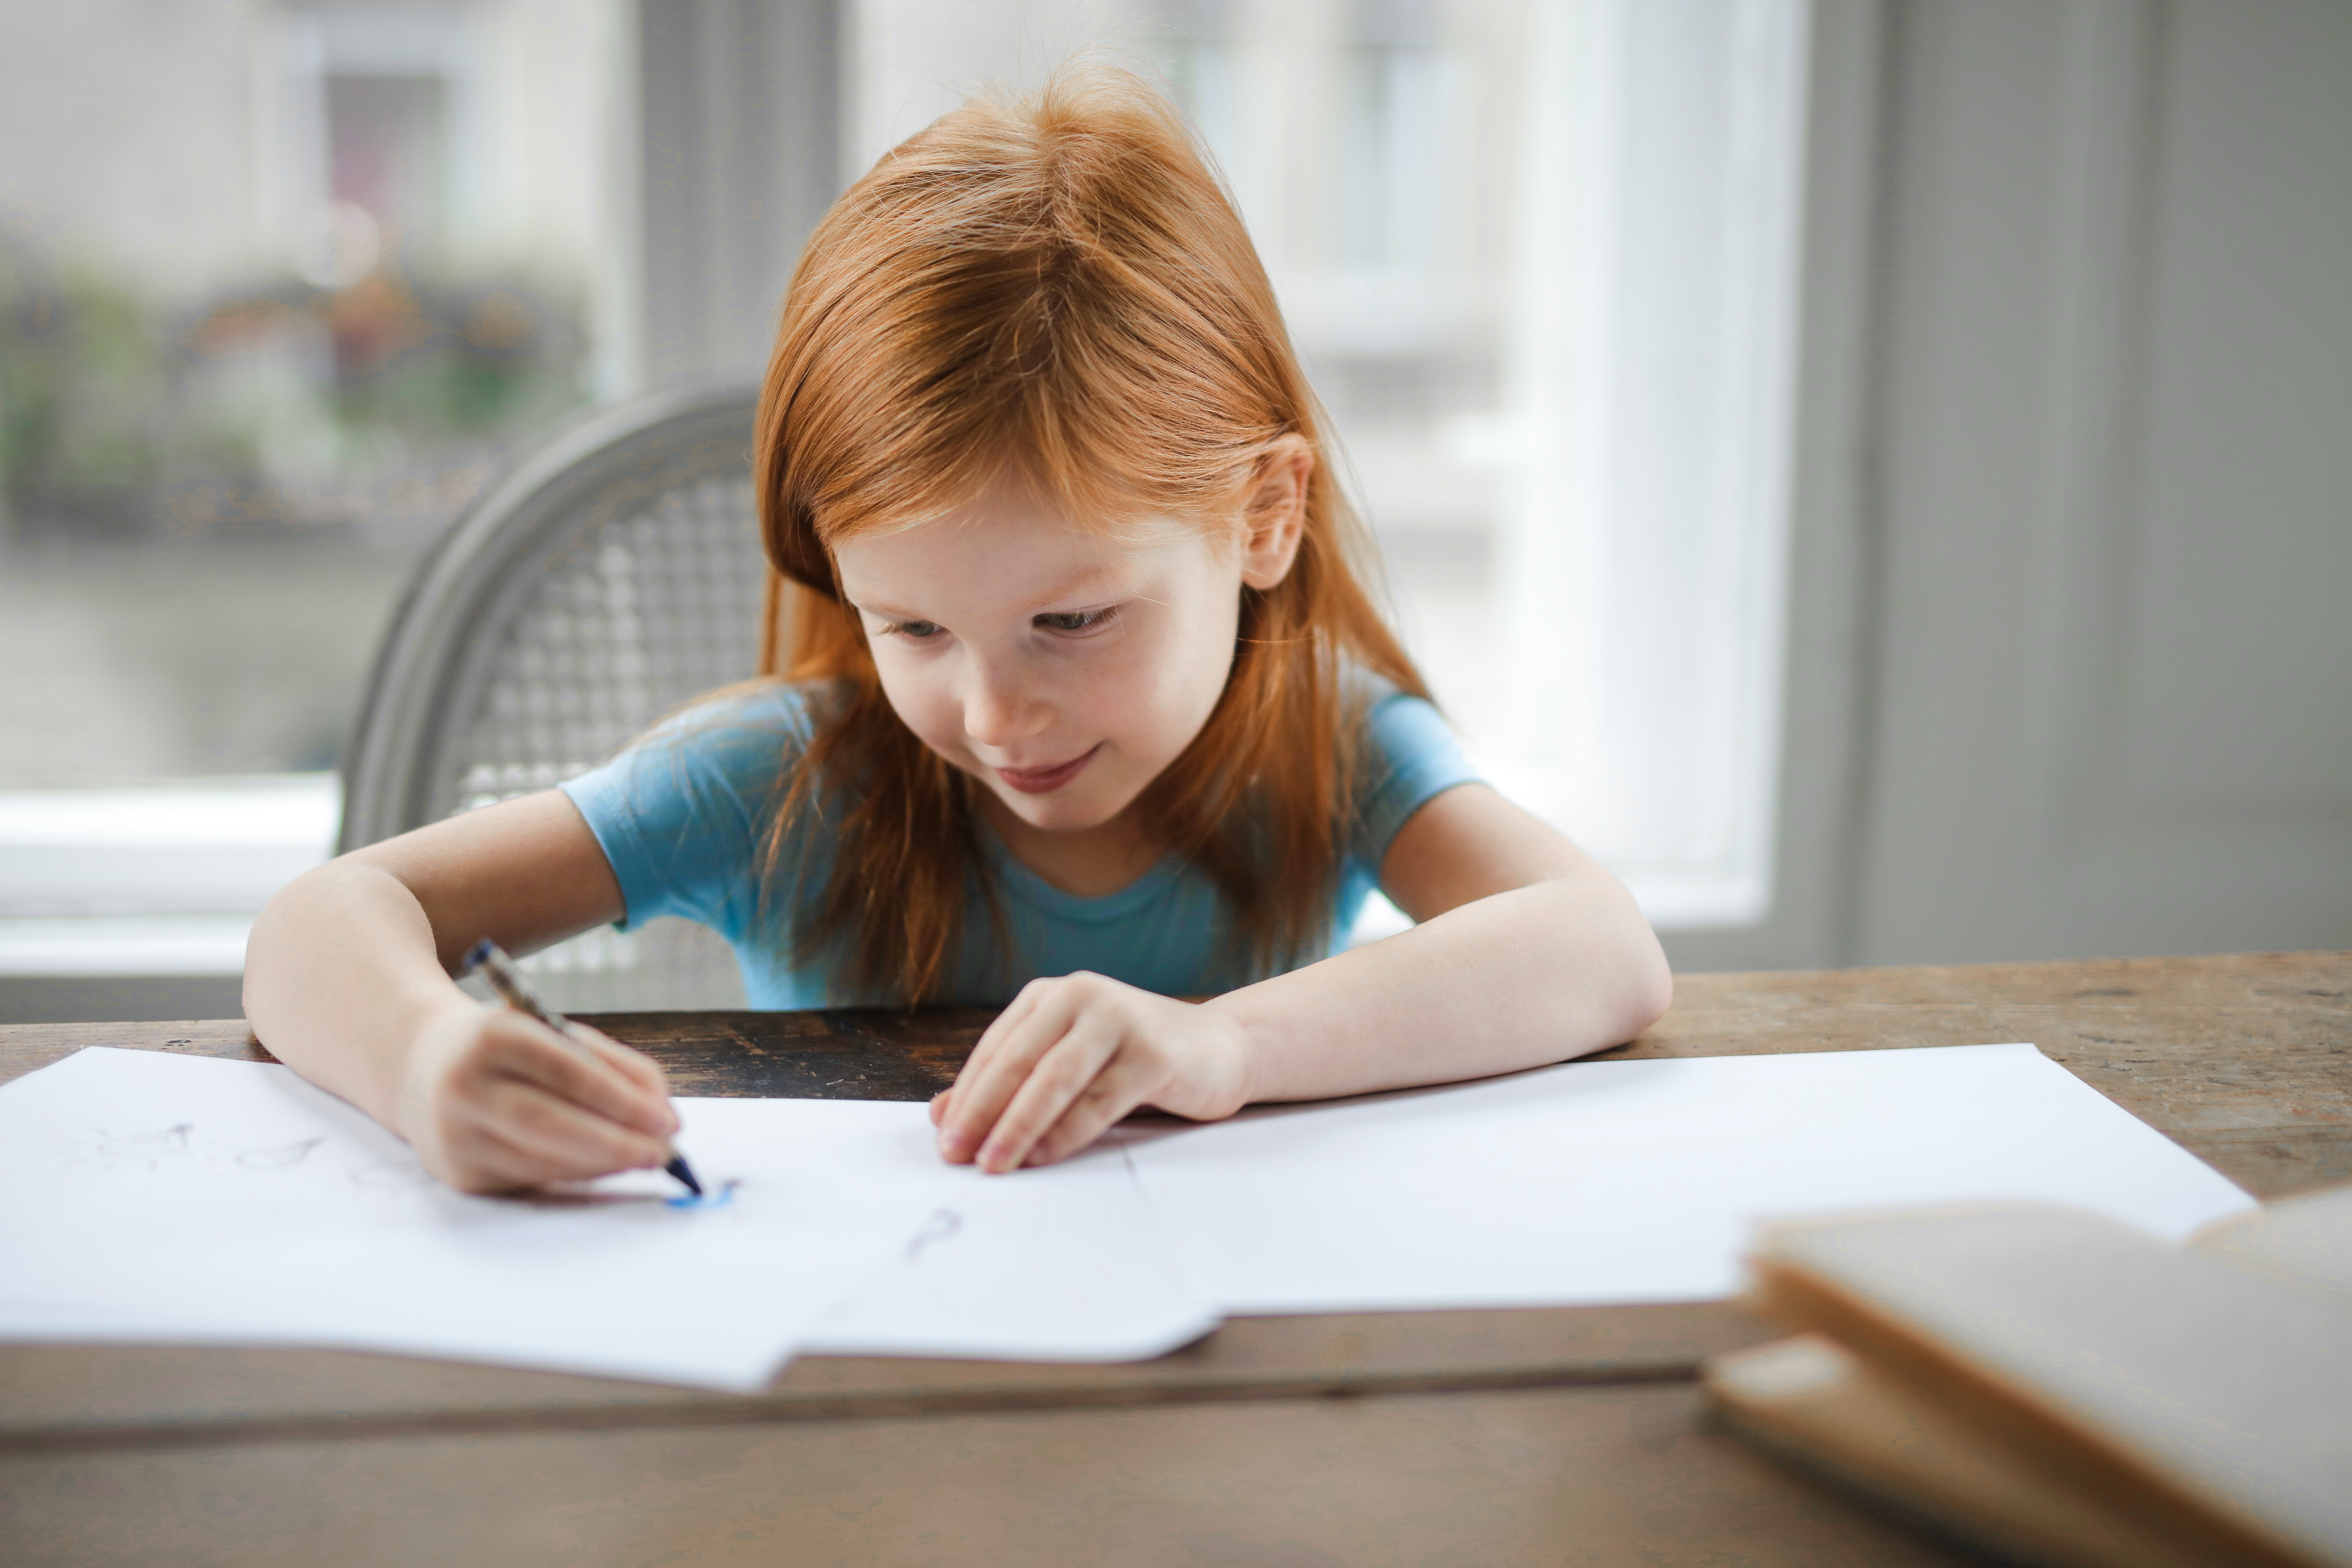 Childhood pre-school education